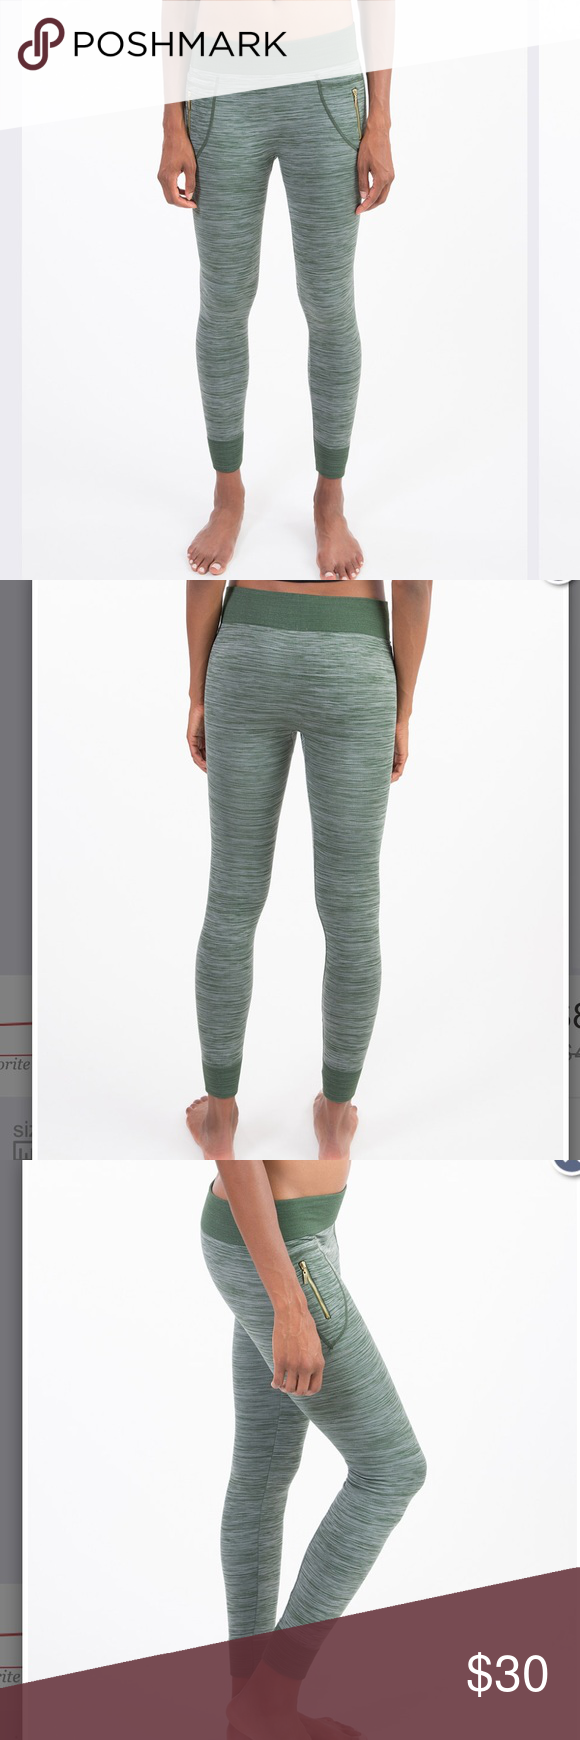 35a62df929 NEW Olive Fleece Space Dyed Zip Pocket Leggings NWT fleece lined leggings  with Zipper pockets size L/XL Pants Leggings